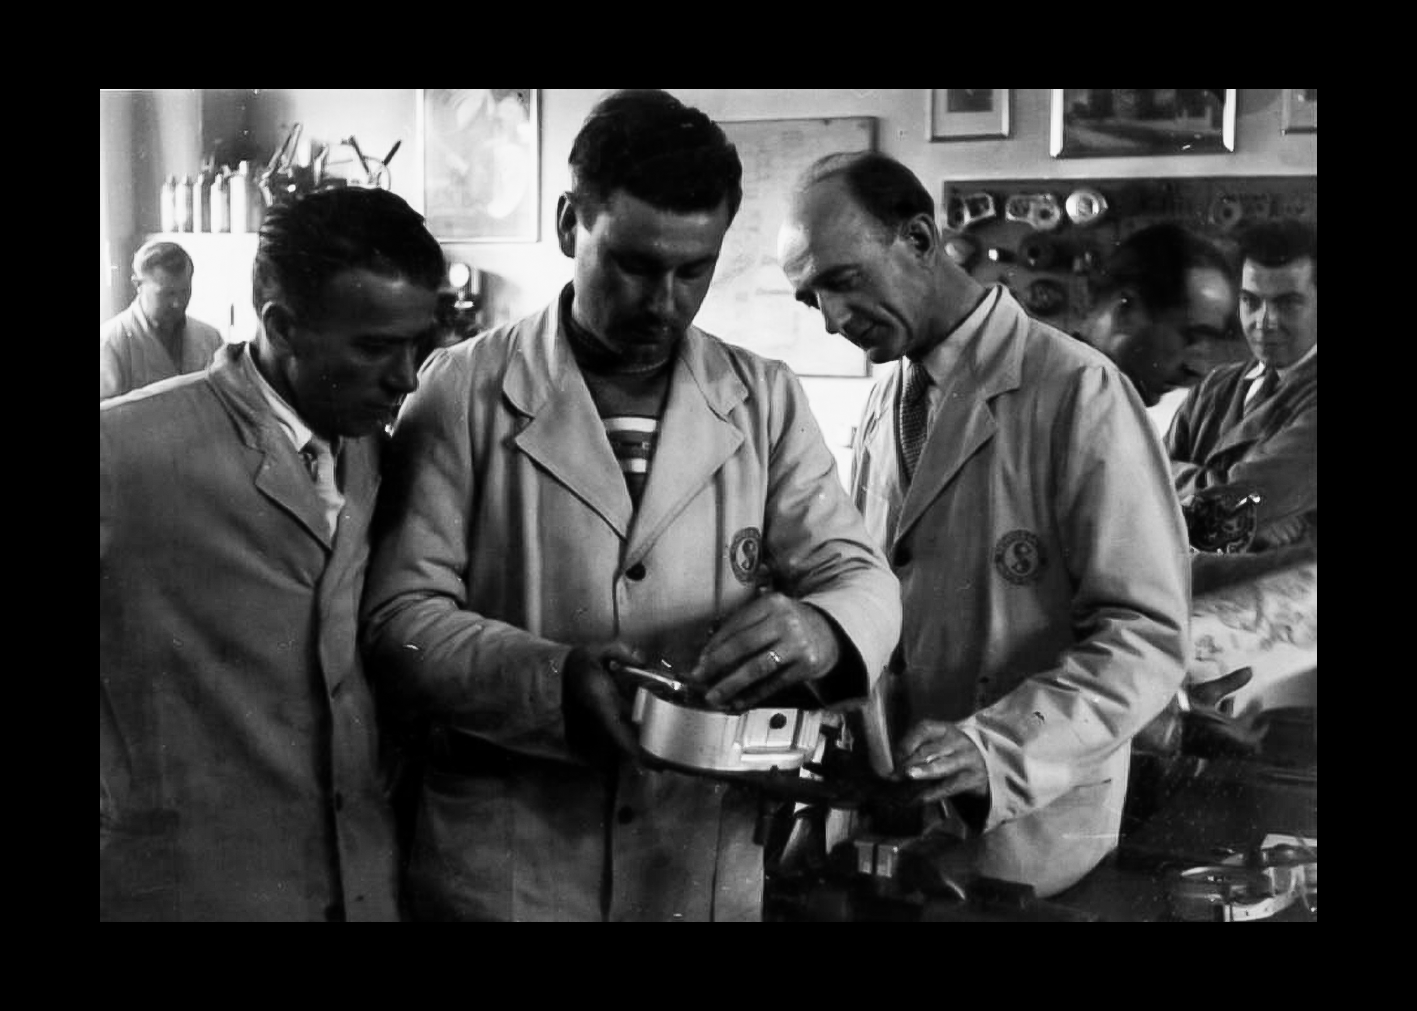 Vergnani Ivo in officina con tecnici Tedeschi